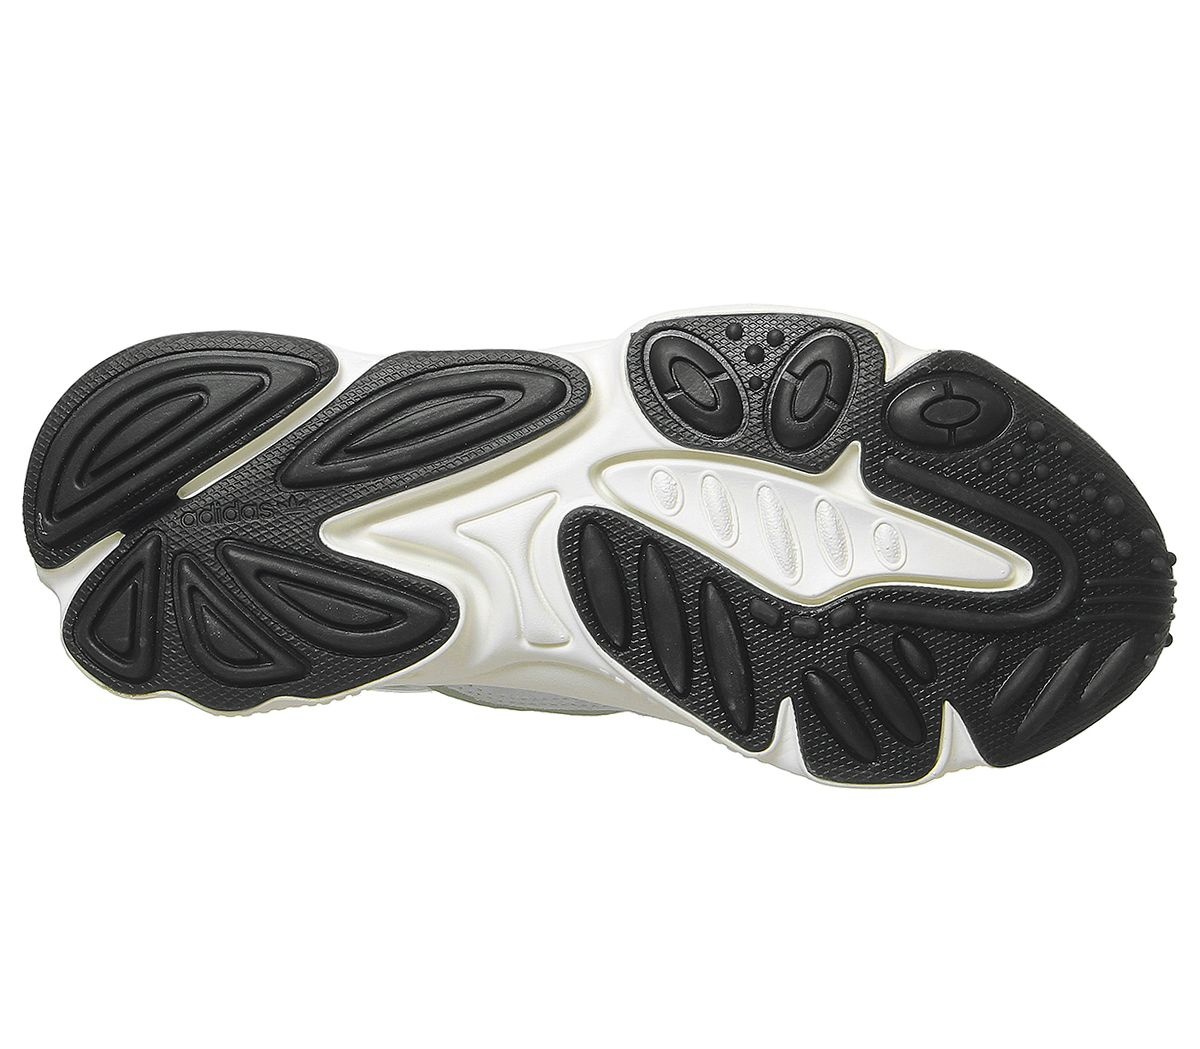 Adidas-ozweego-Baskets-Blanc-Cristal-Blanc-casse-Baskets-Chaussures miniature 6